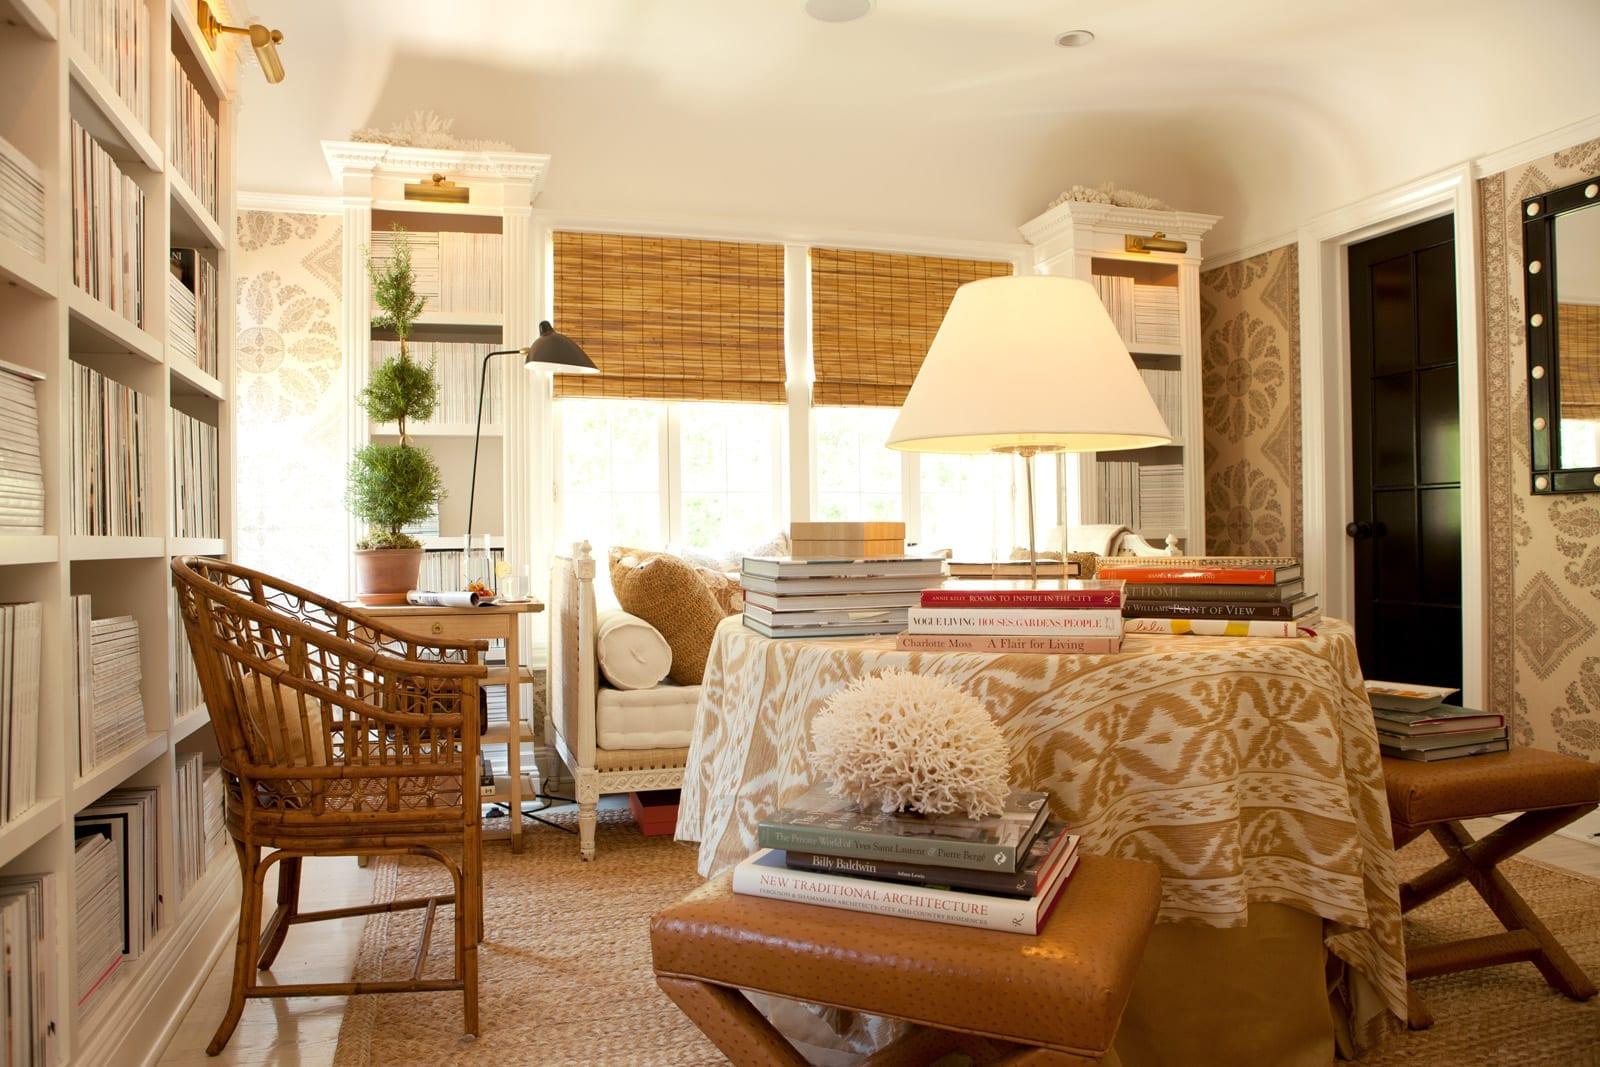 Best House Interior Design Pictures